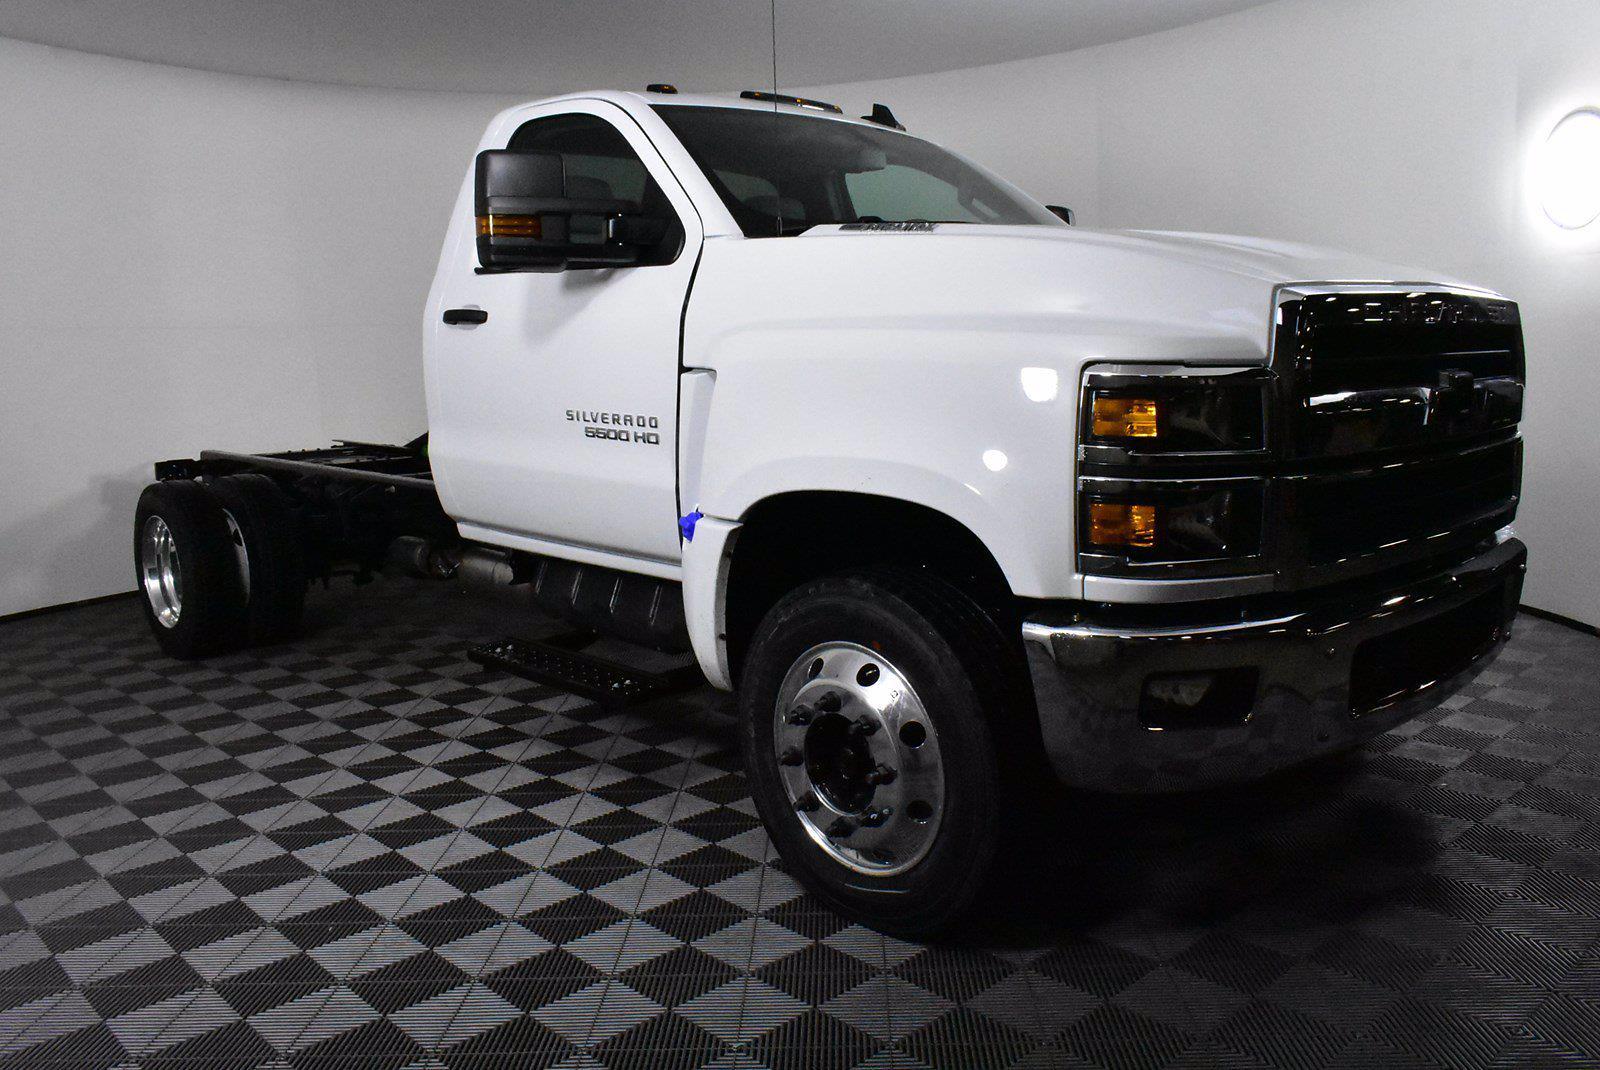 2020 Chevrolet Silverado 5500 DRW 4x2, Cab Chassis #D100223 - photo 3